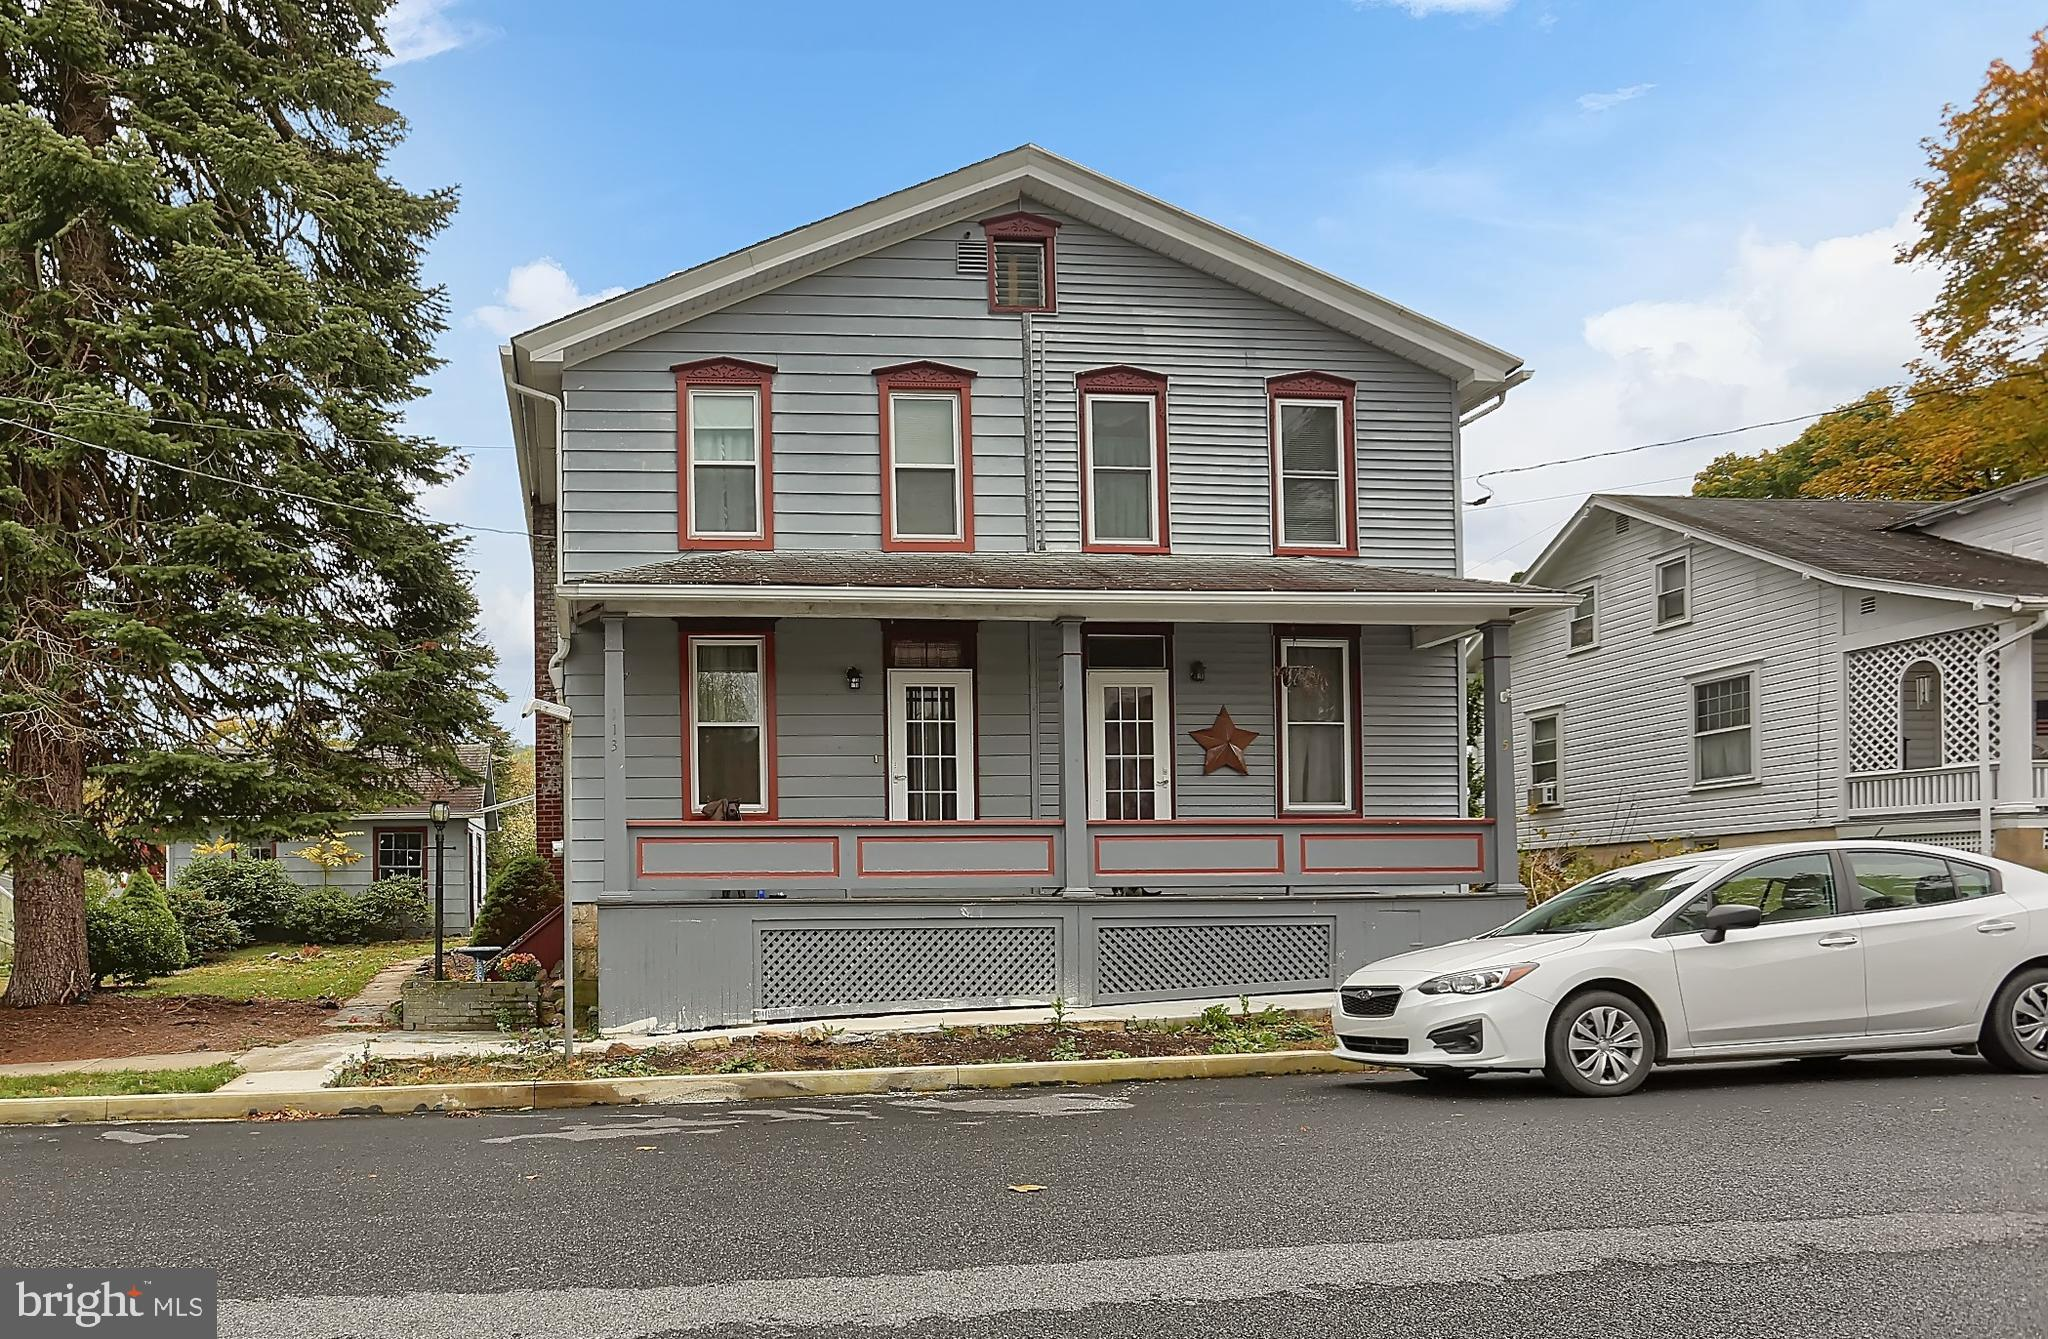 113 W Mcclure Street, New Bloomfield, PA 17068